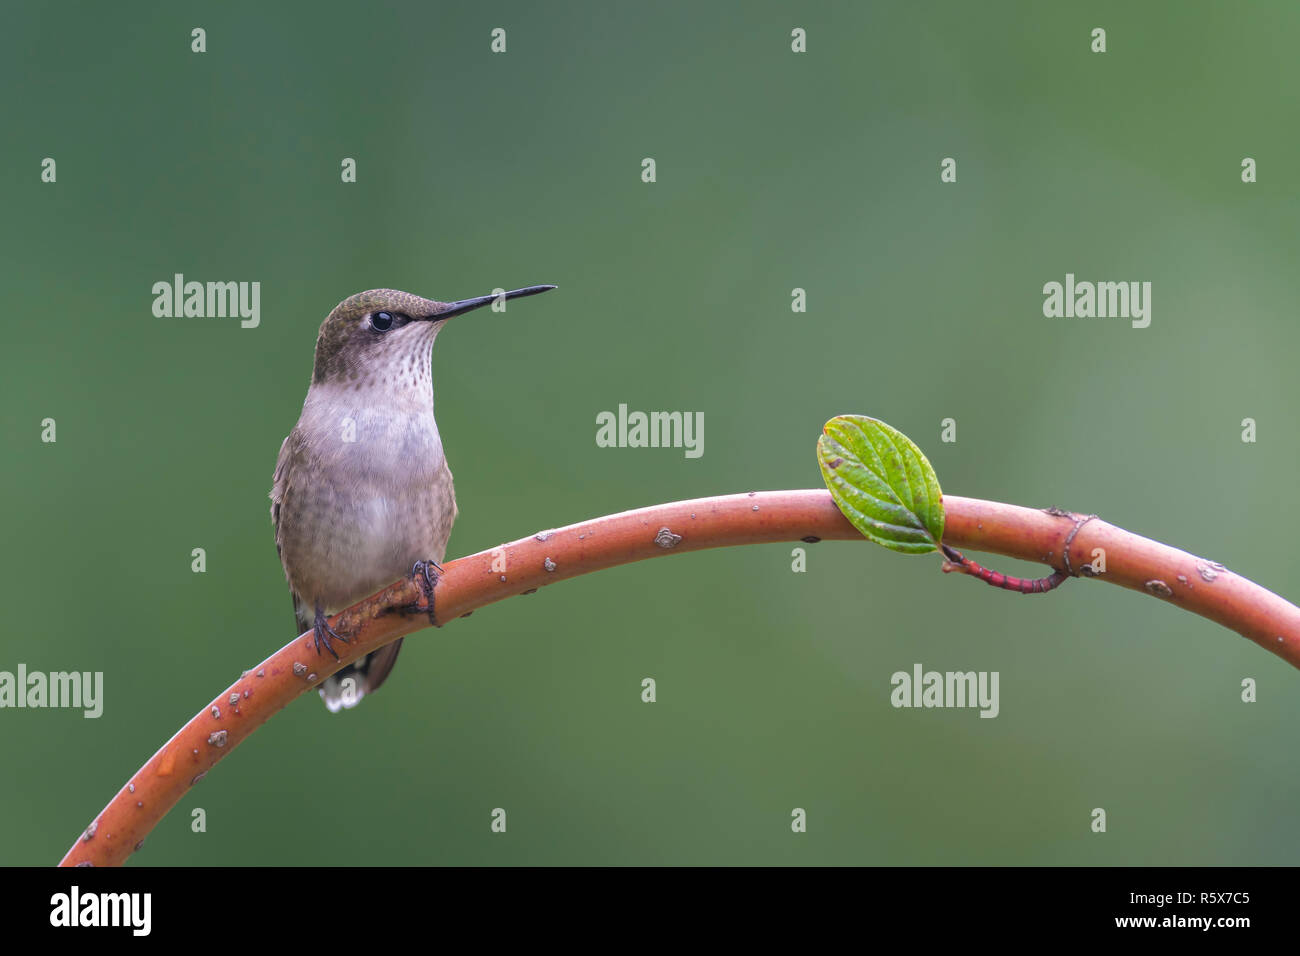 Ruby-throated Hummingbird (Archilochus colubris) female, perched, E USA, by Dominique Braud/Dembinsky Photo Assoc Stock Photo